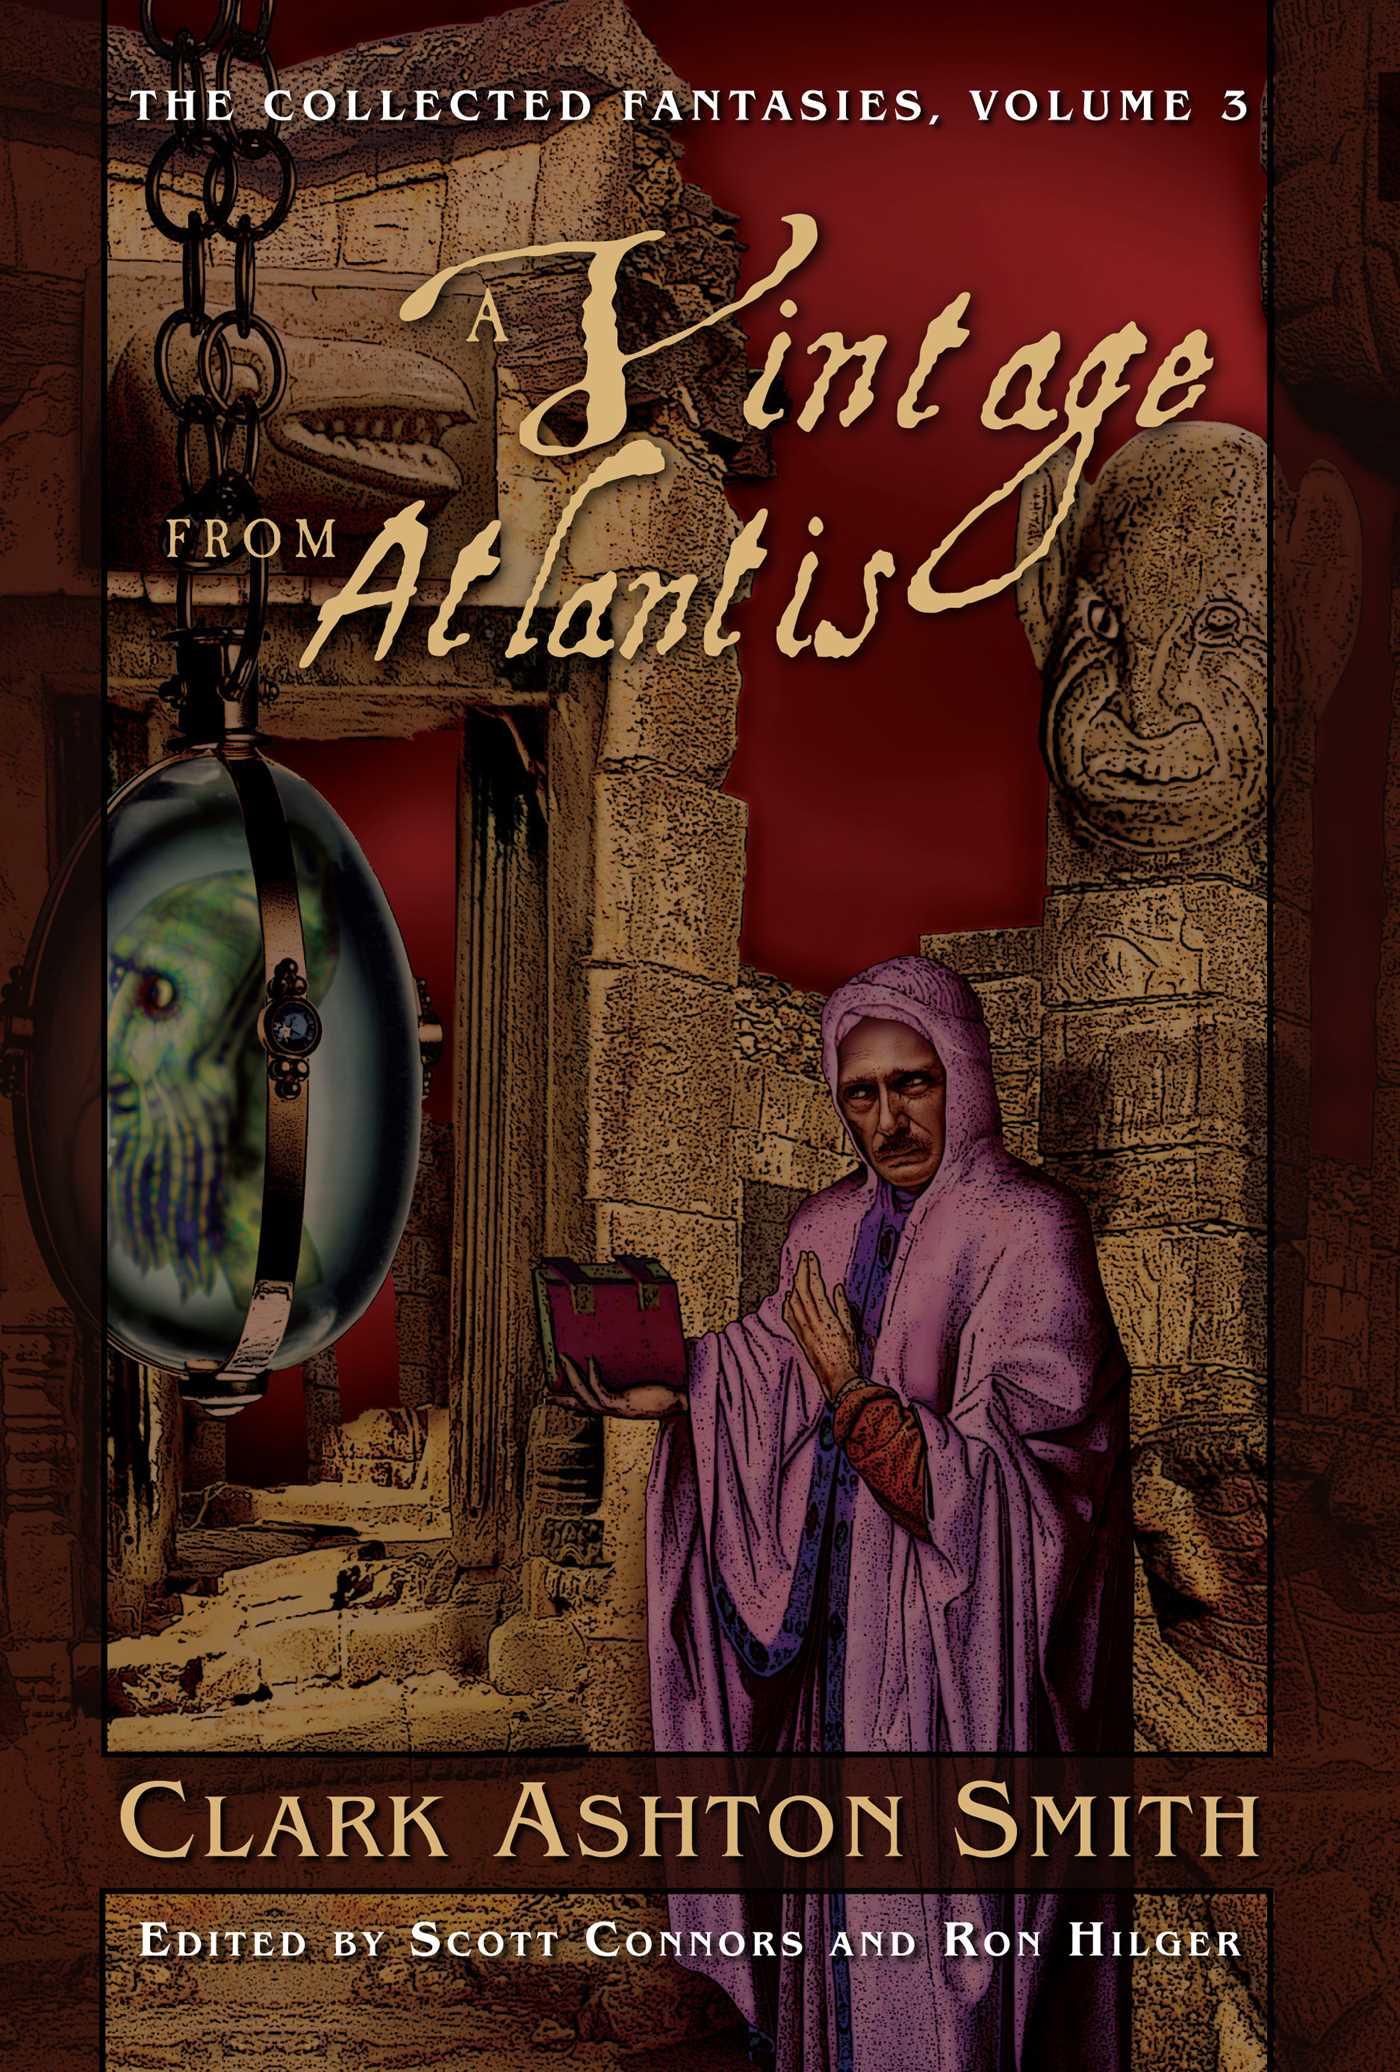 Collected Fantasies of Clark Ashton Smith Volume 3: A Vintage From Atlantis